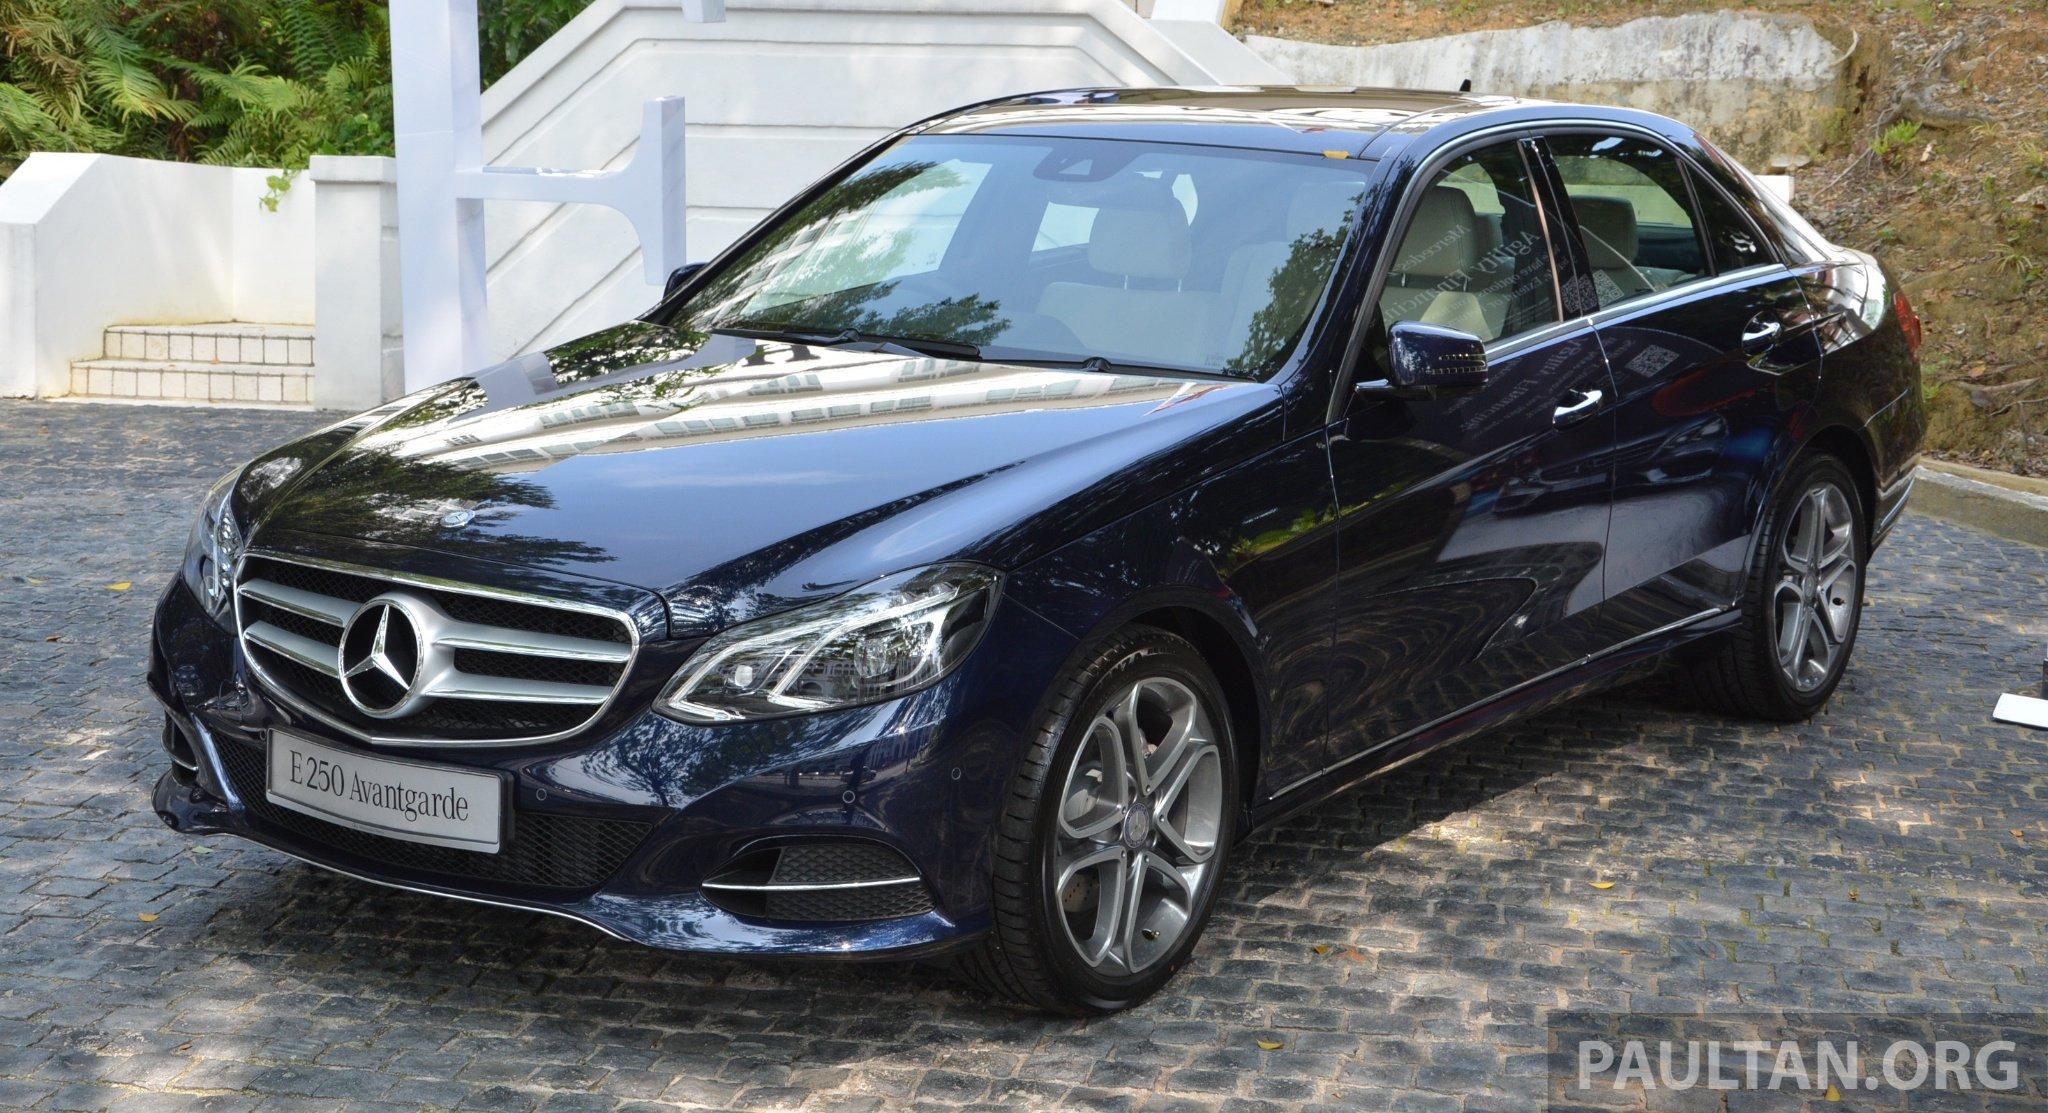 Mercedes Benz >> W212 Mercedes-Benz E-Class facelift launched – E 200 Avantgarde and E 250 Avantgarde, RM367k ...